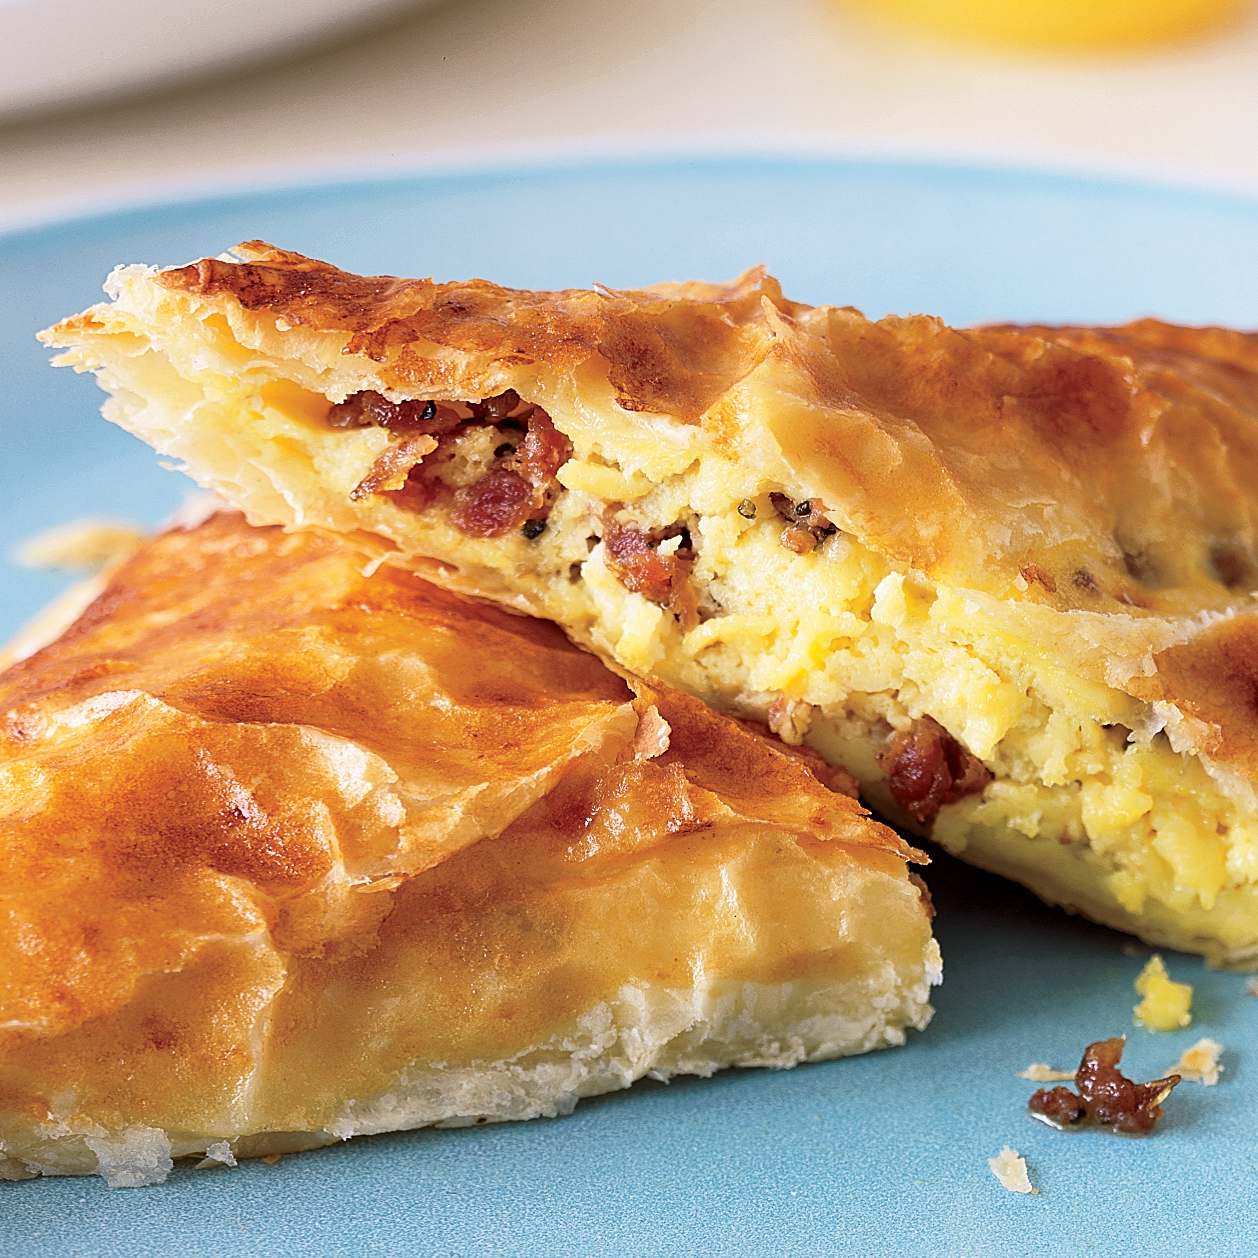 Sausage, Egg and Cheese Turnovers